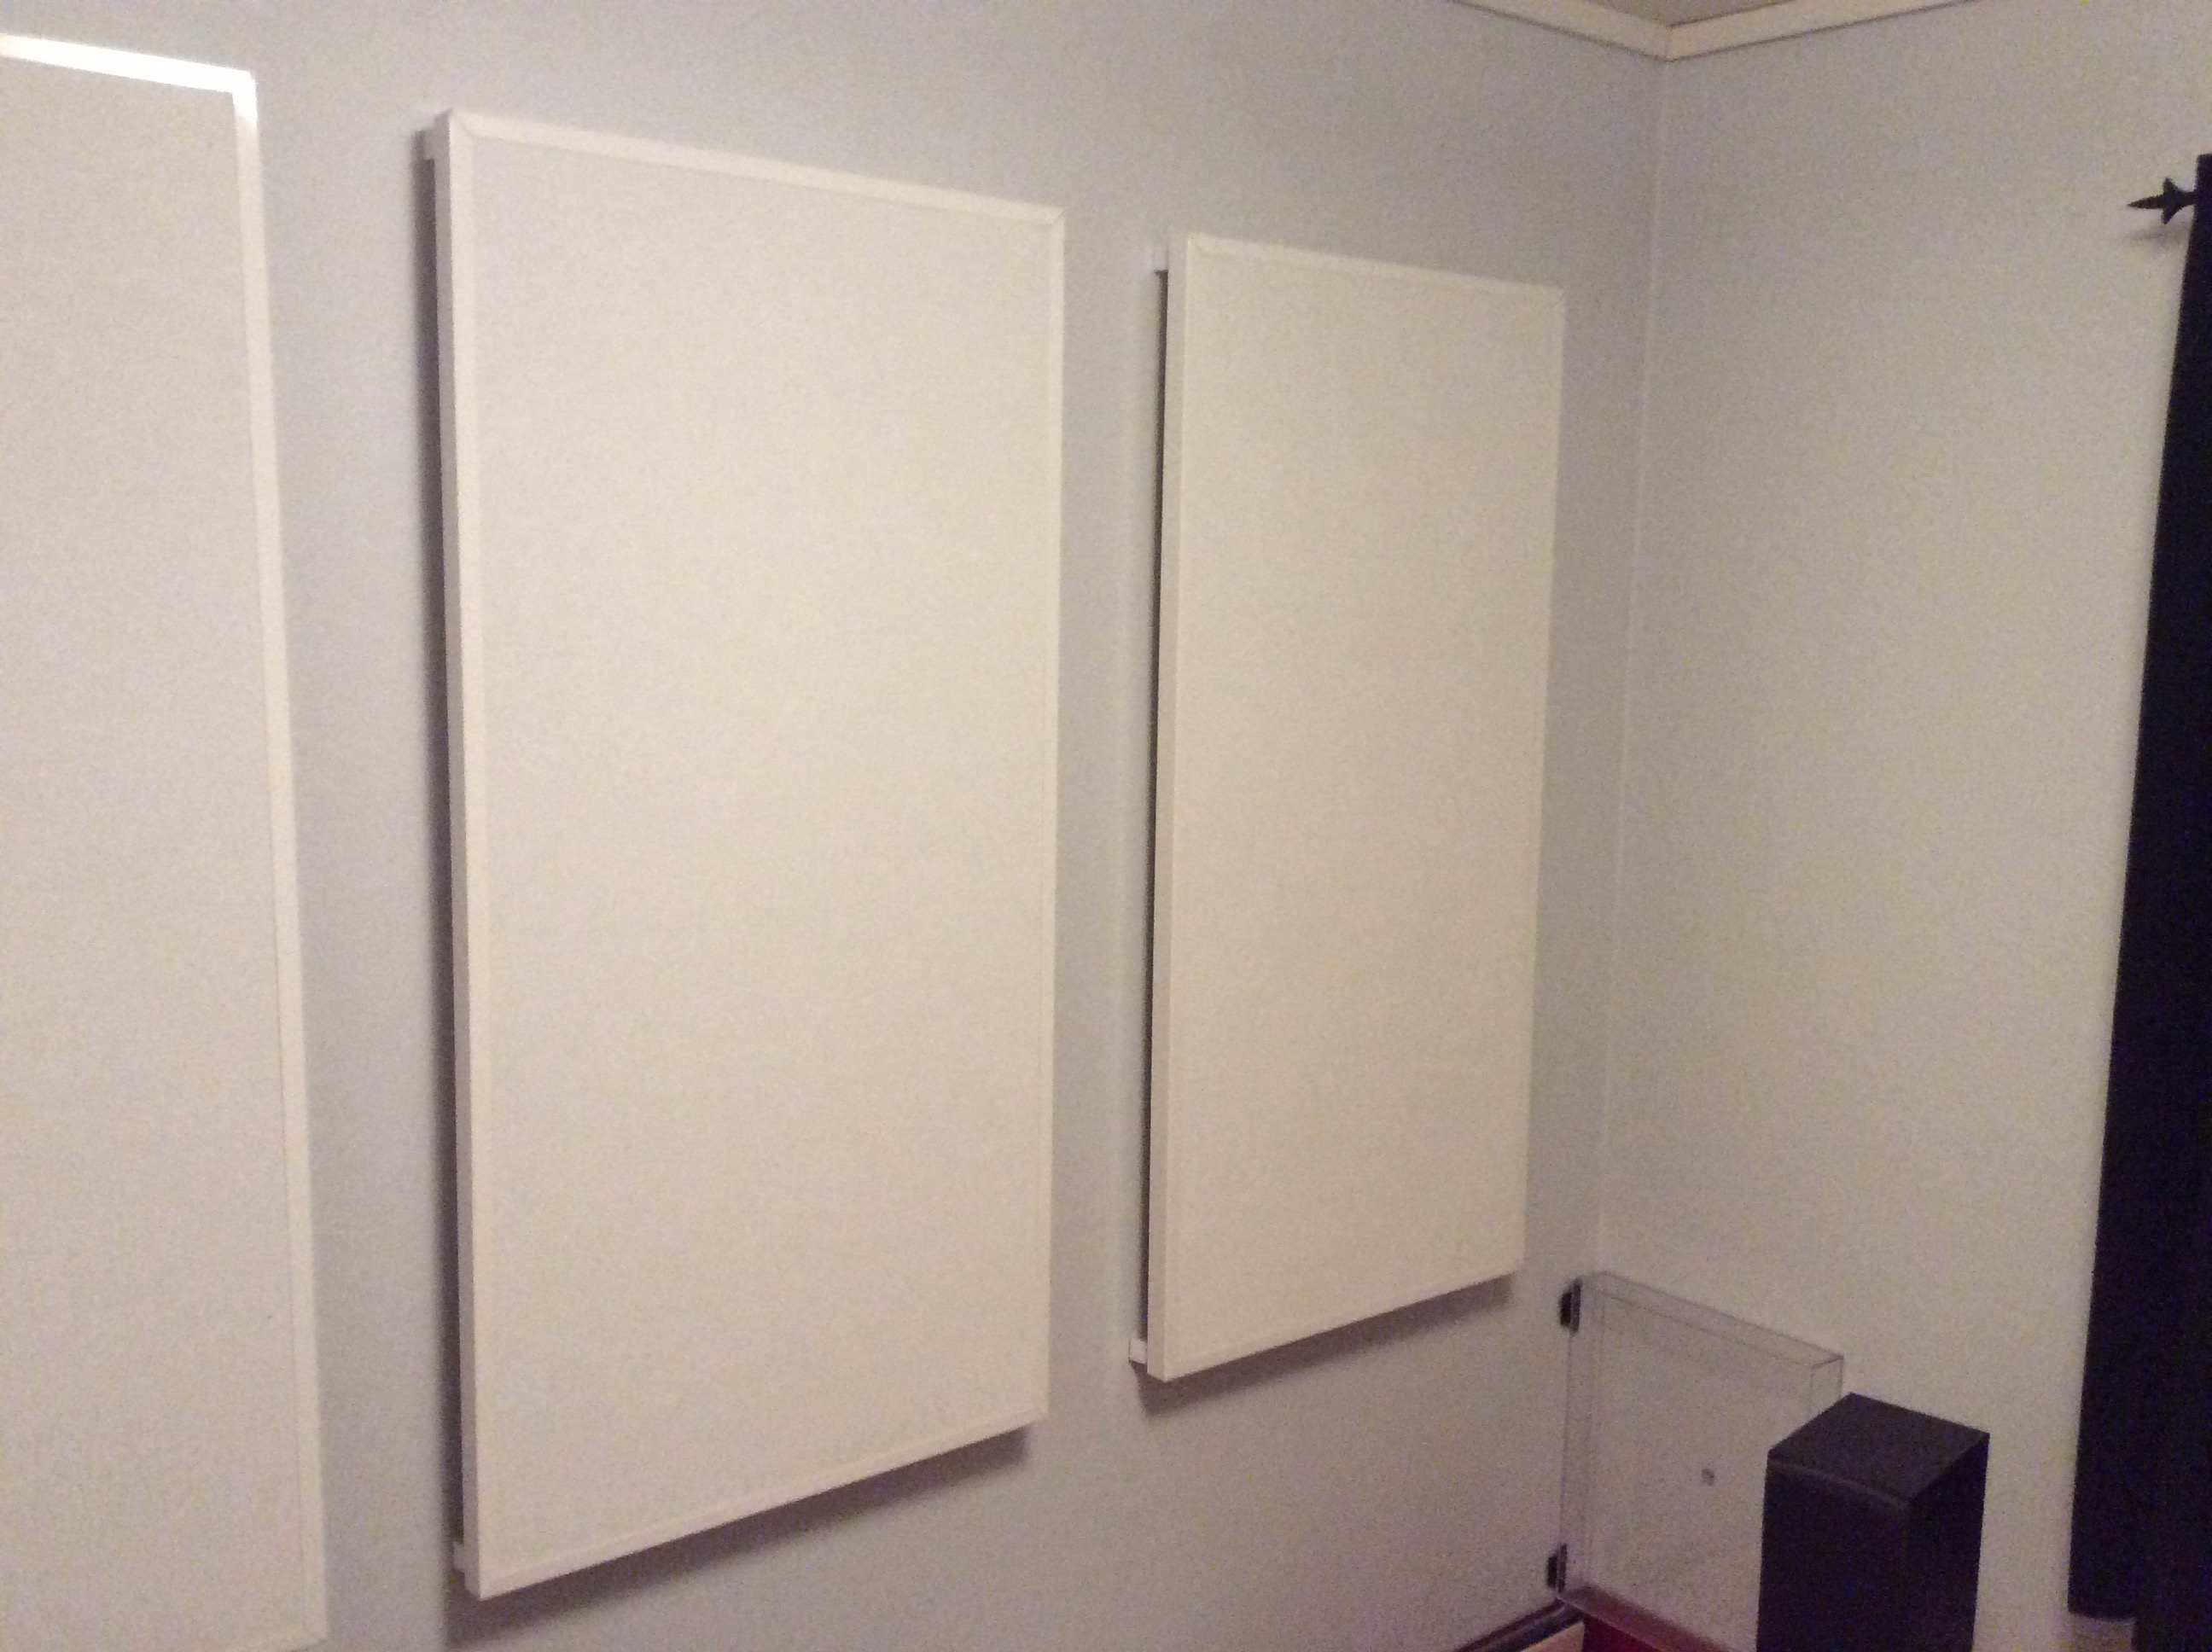 Støydempende veggplater